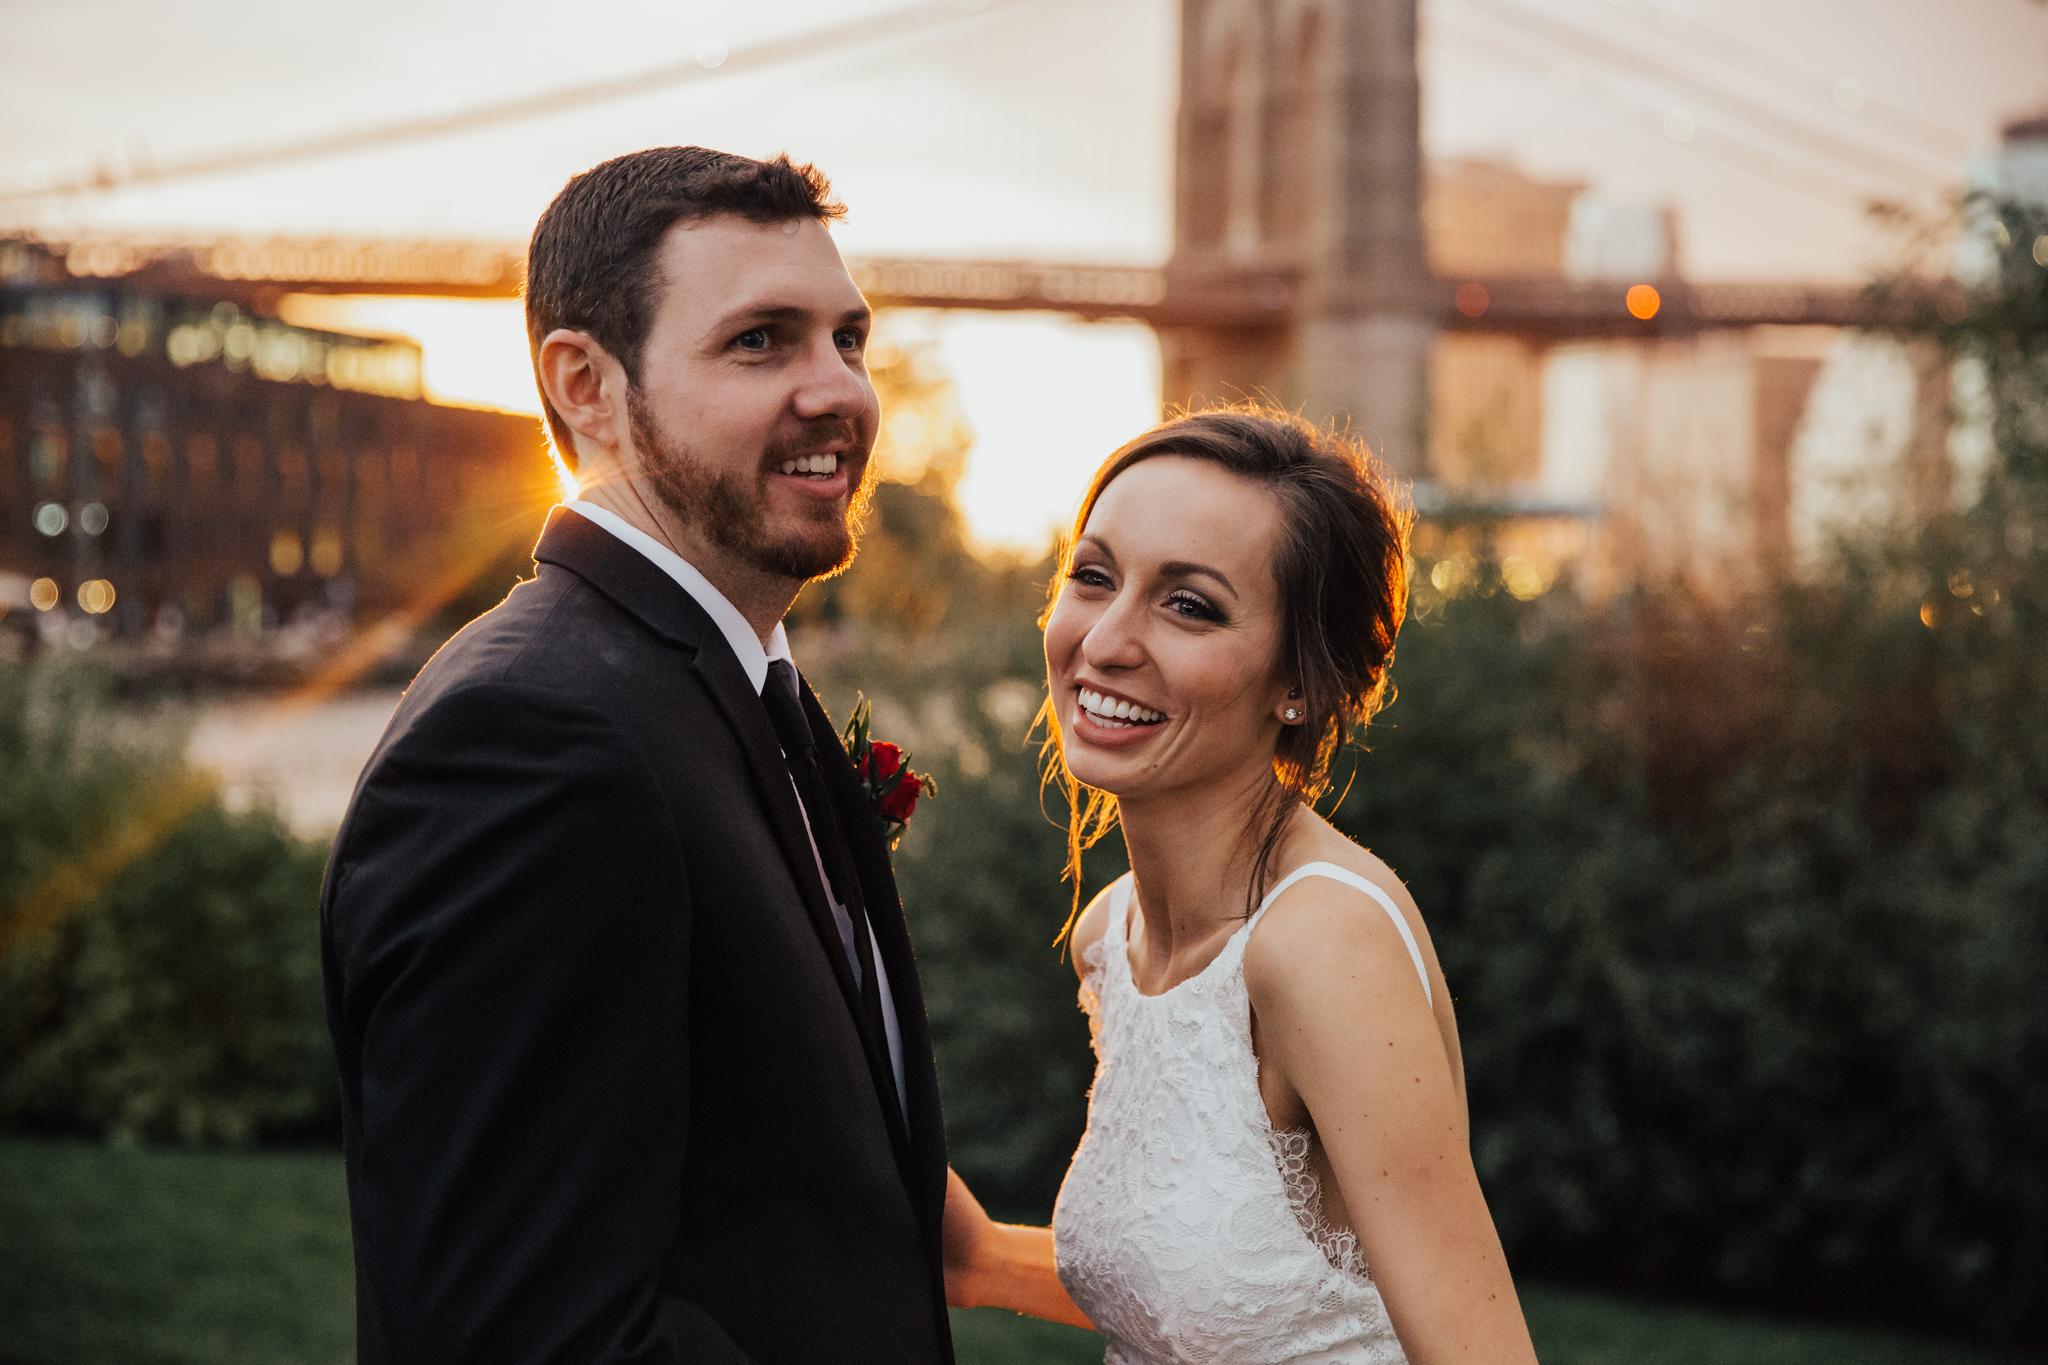 26-bridge-wedding-brooklyn-070.JPG